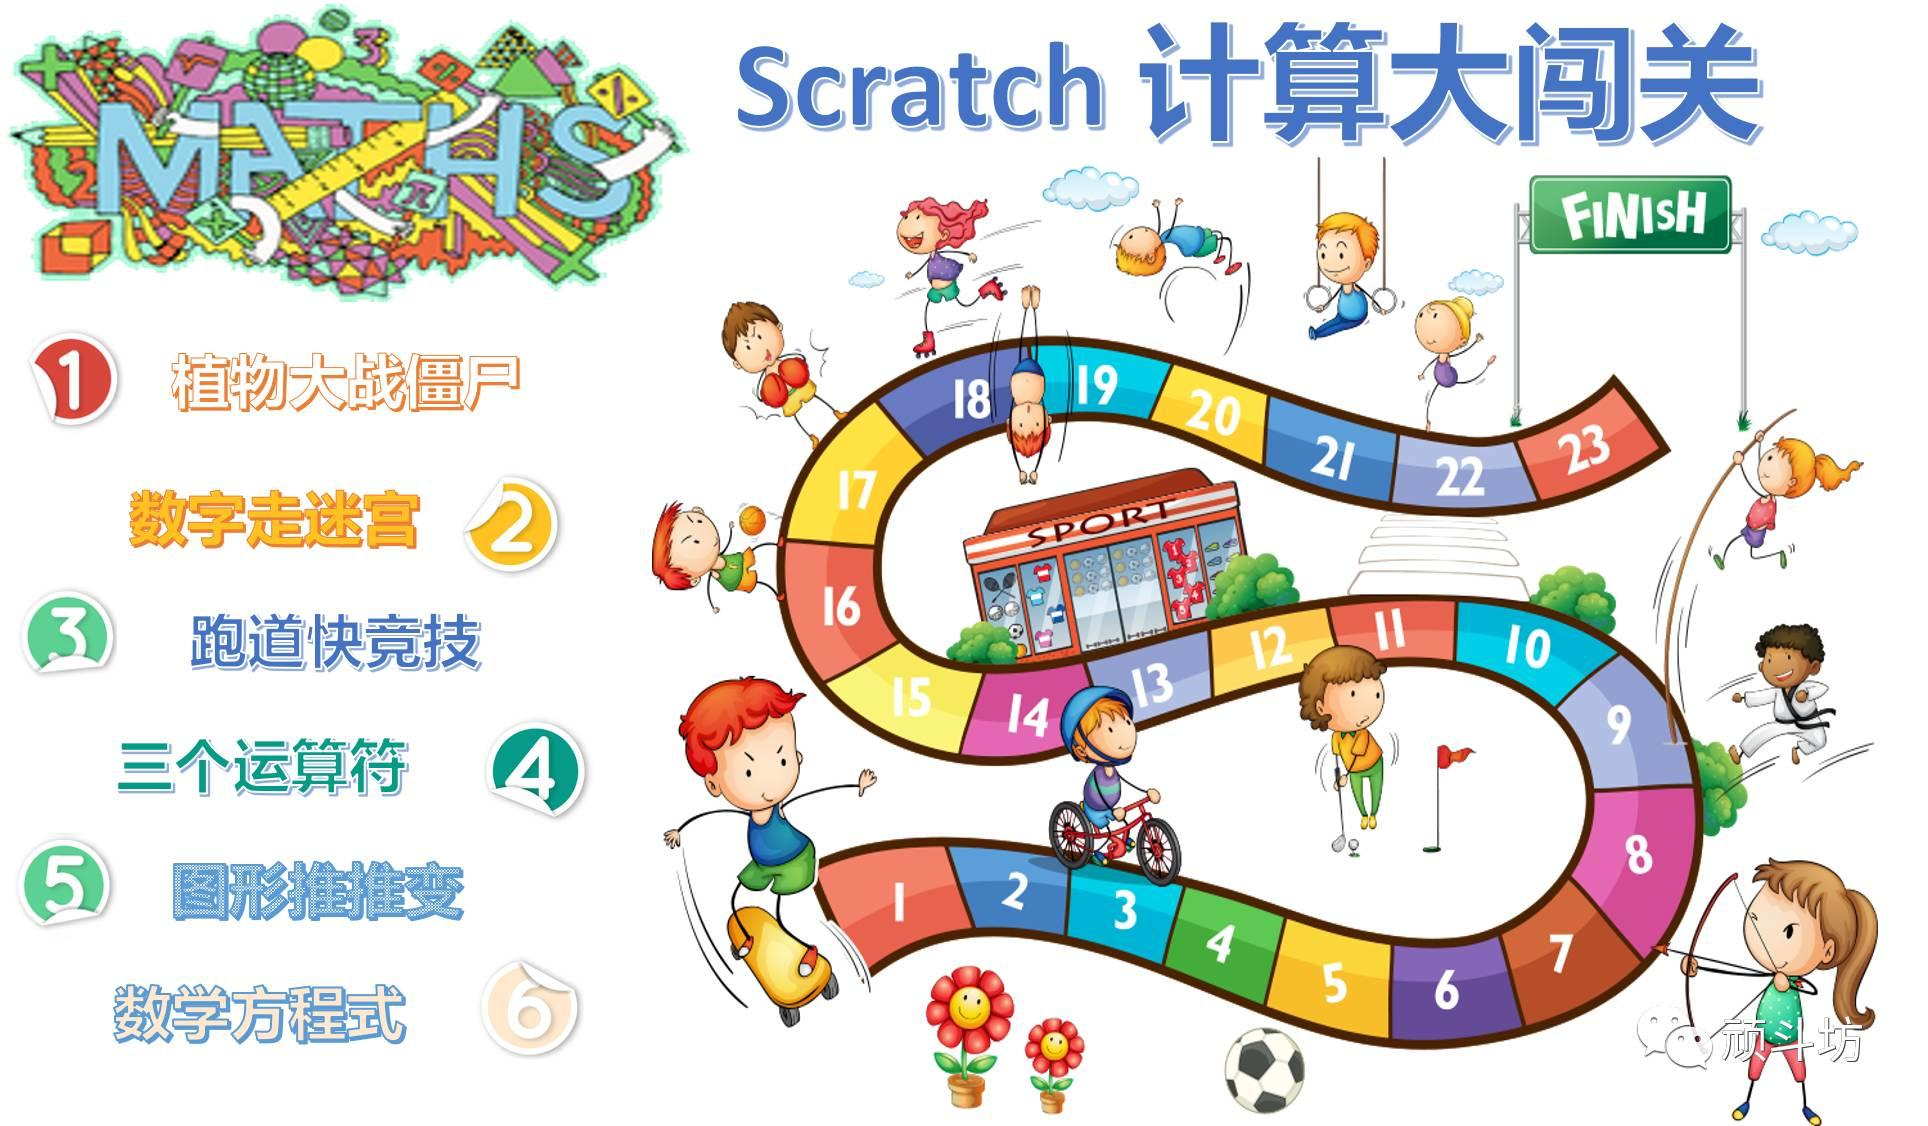 Scratch数学计算 课程大纲